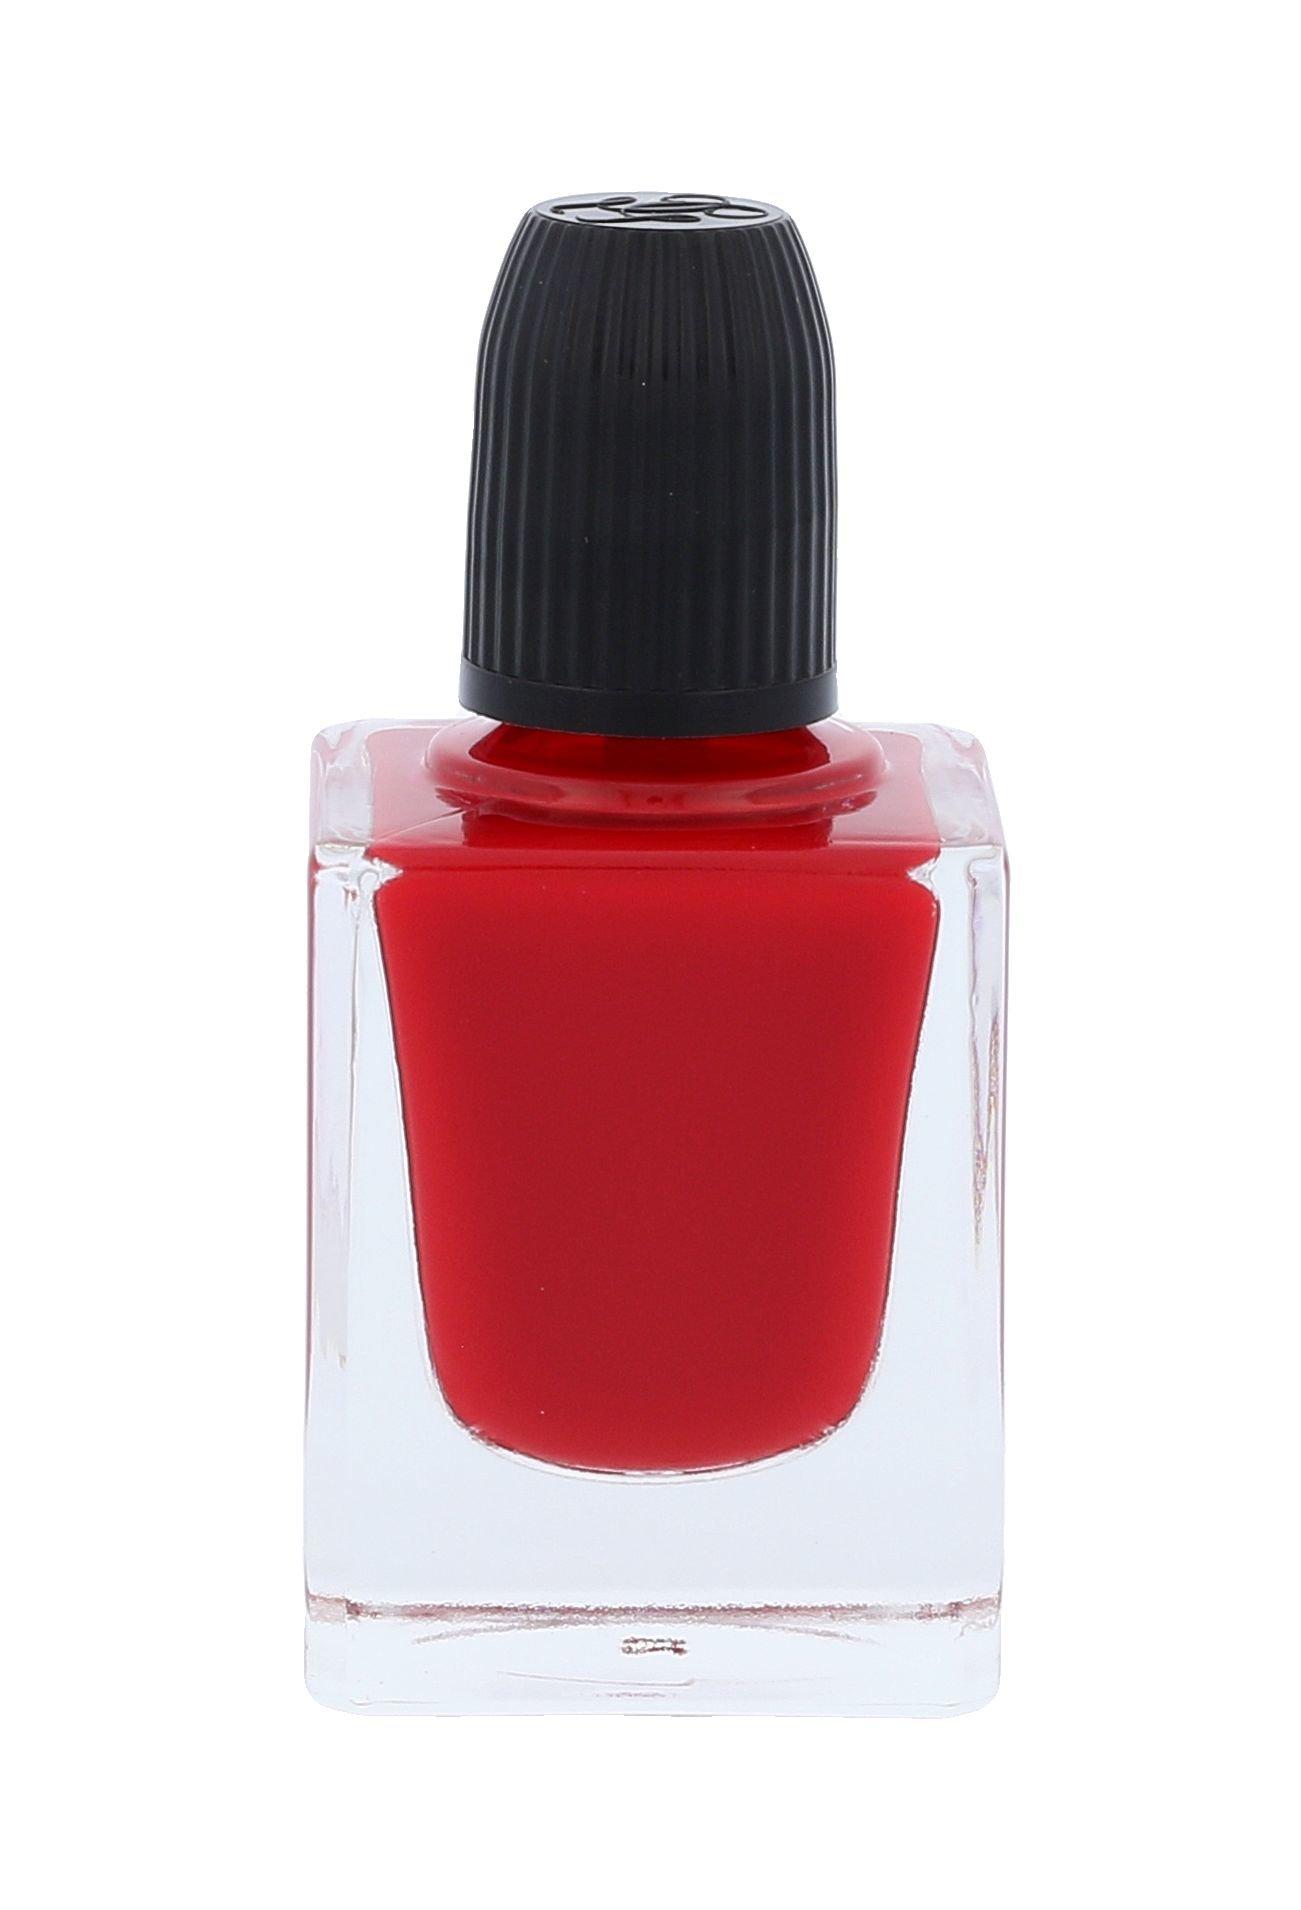 Guerlain La Petite Robe Noire Cosmetic 8,8ml 022 Red Bow Tie